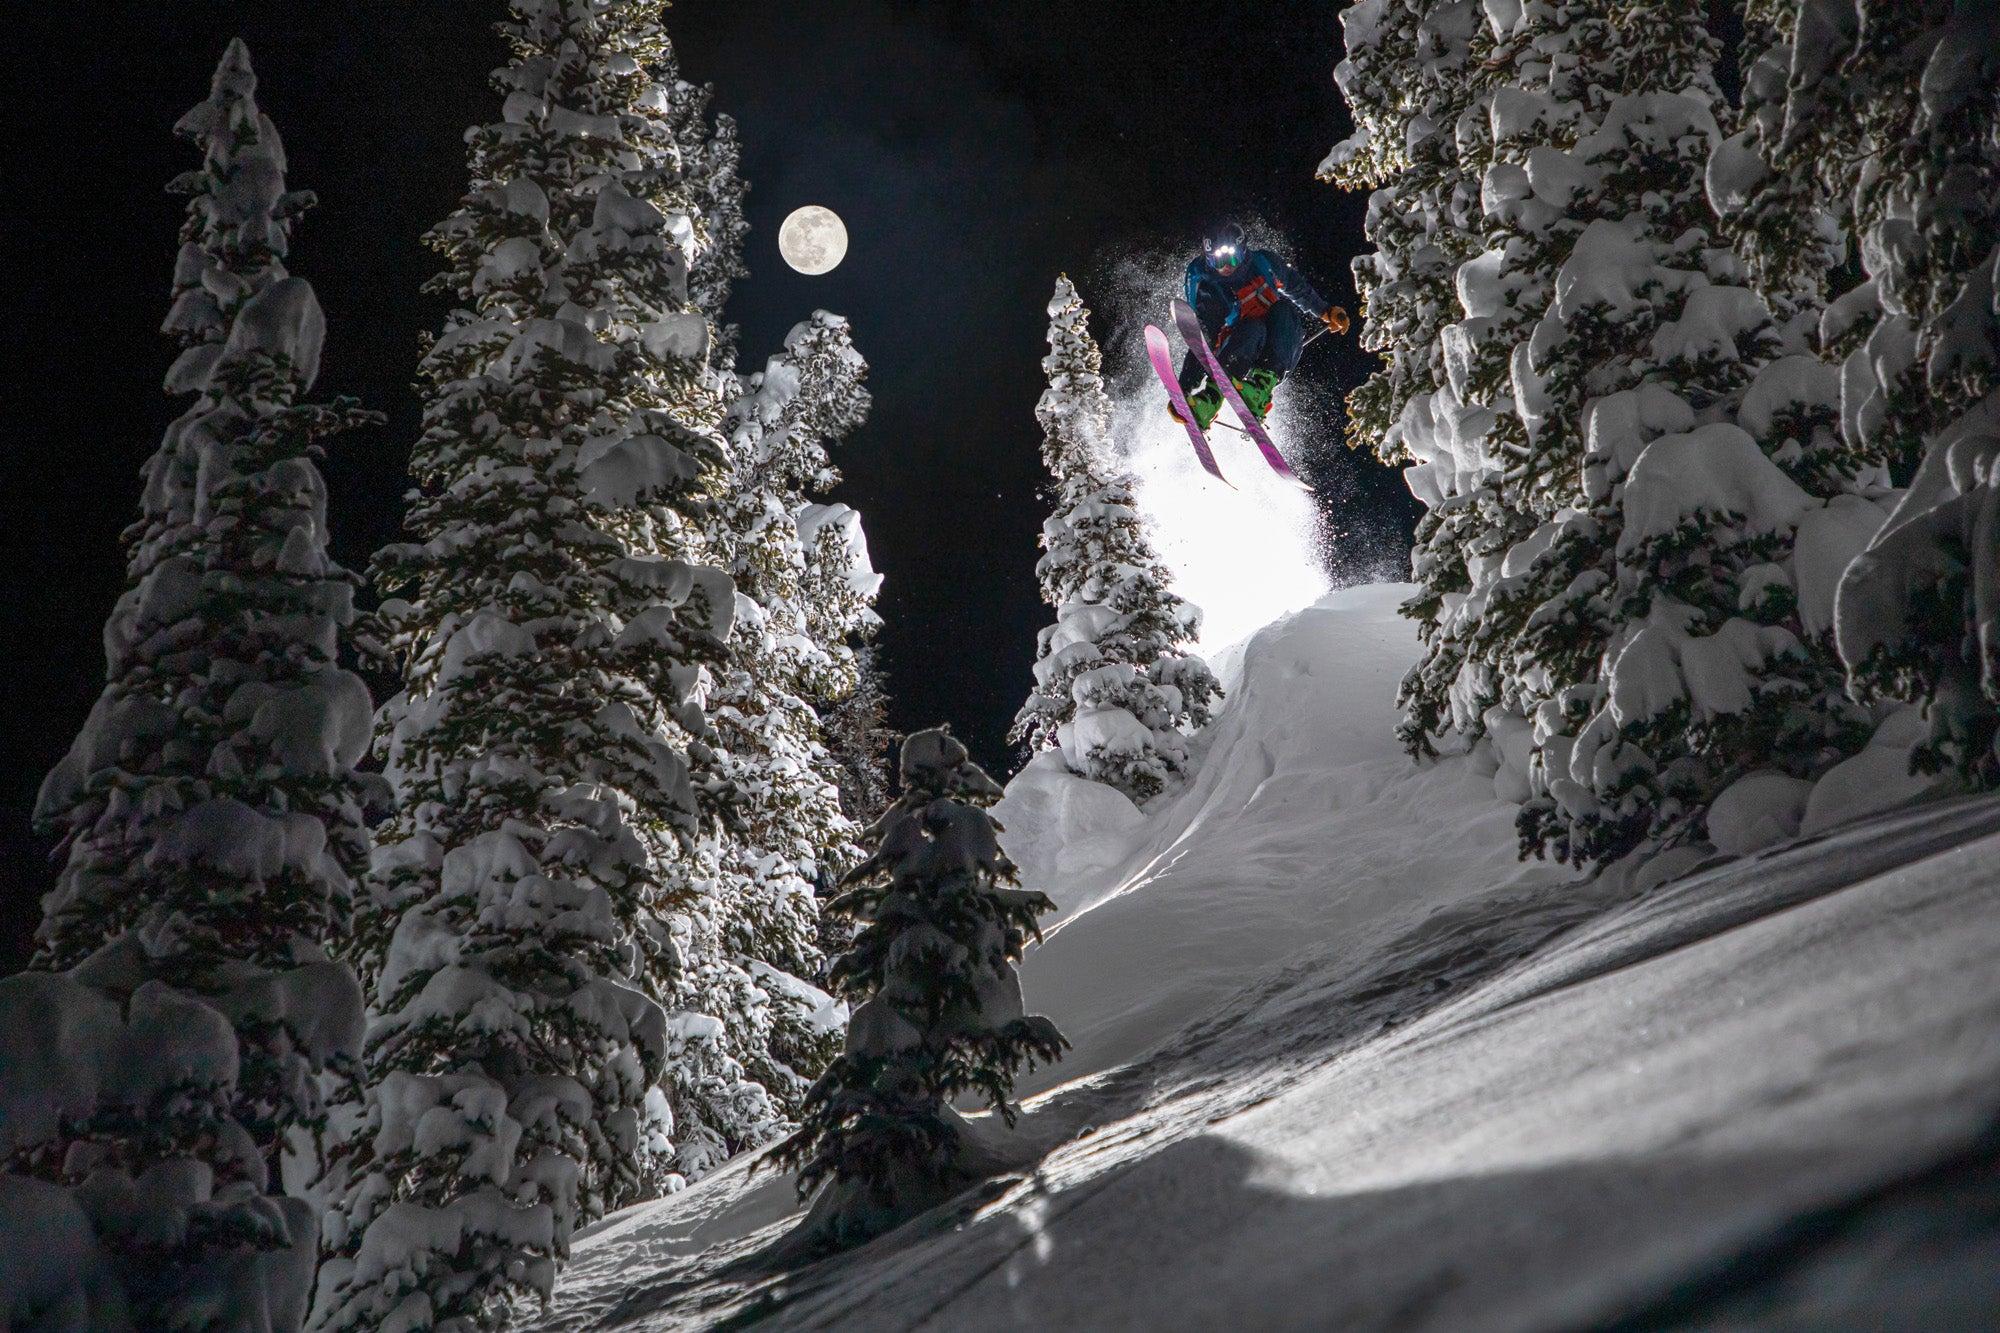 Full Moon Backcountry Skiing